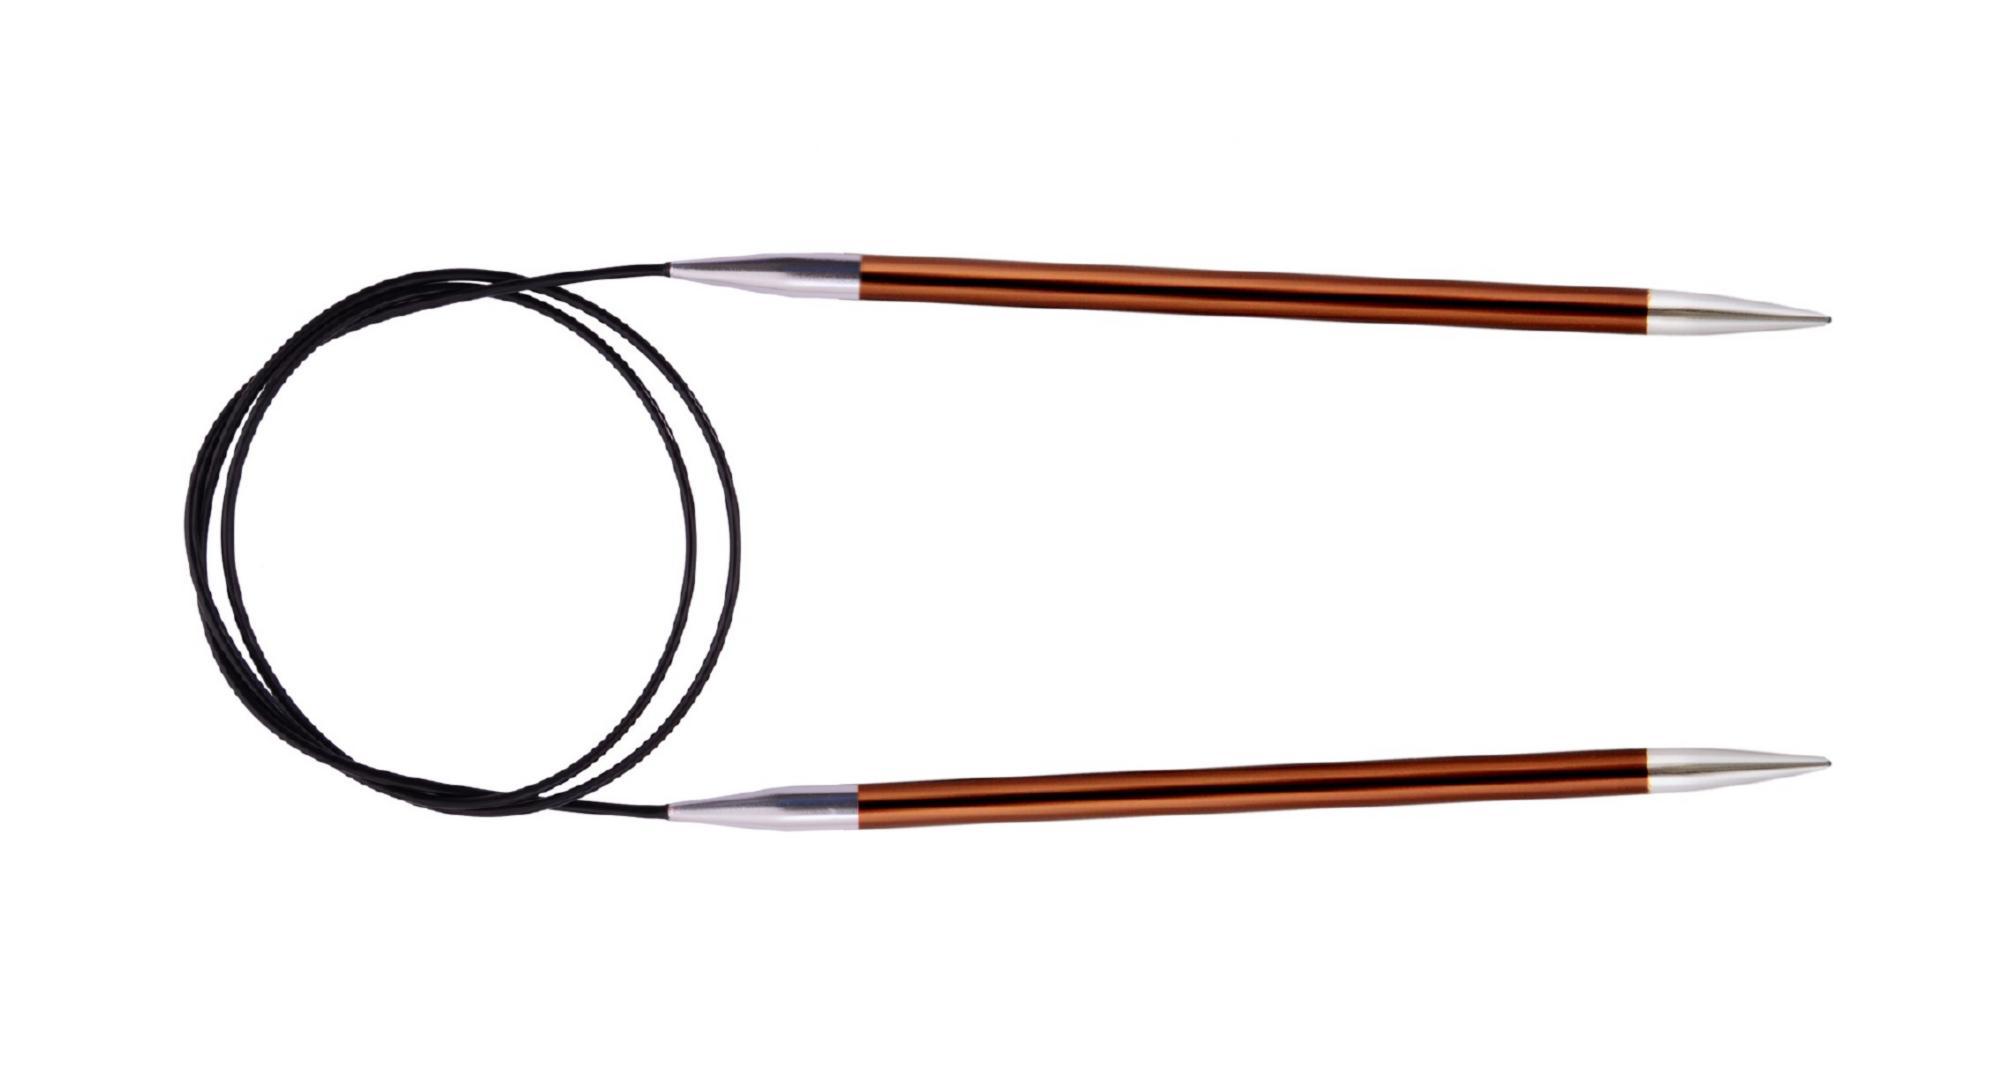 Спицы круговые 80 см Zing KnitPro, 47132, 5.50 мм